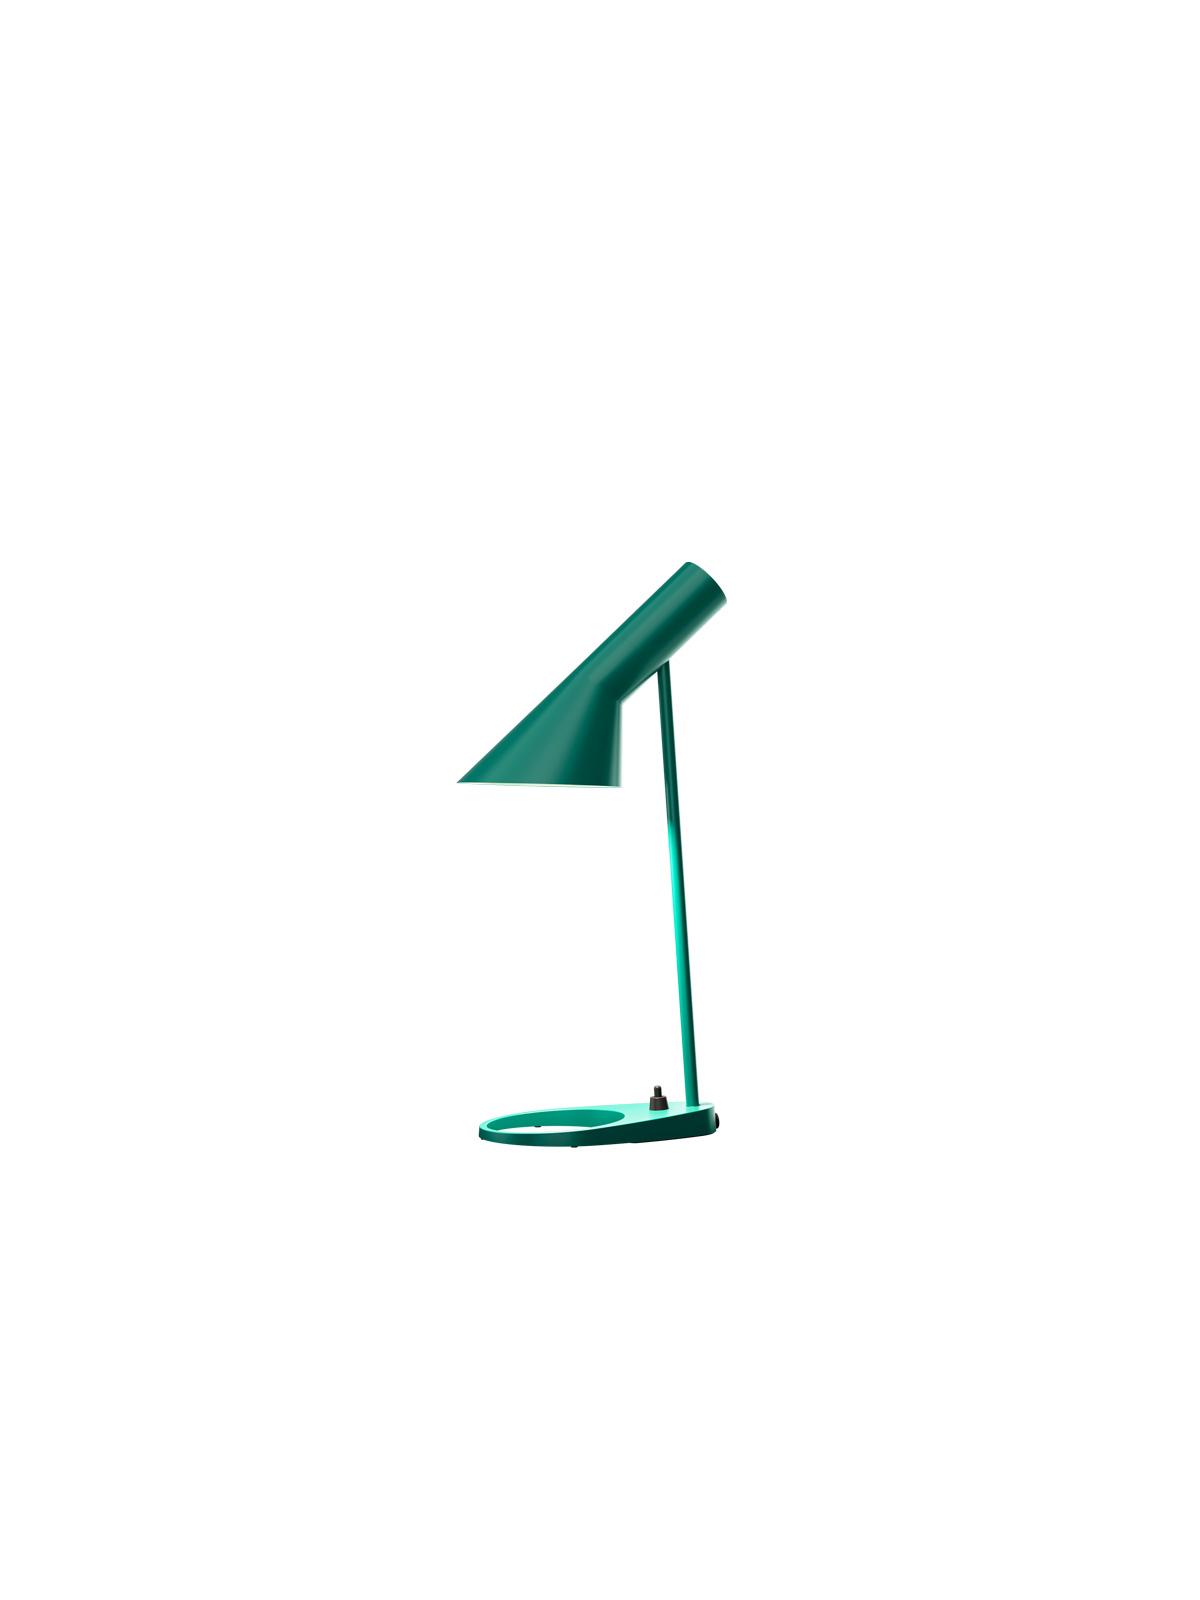 AJ Mini Tischleuchte Louis Poulsen DesignOrt Onlineshop Lampen Laden Berlin